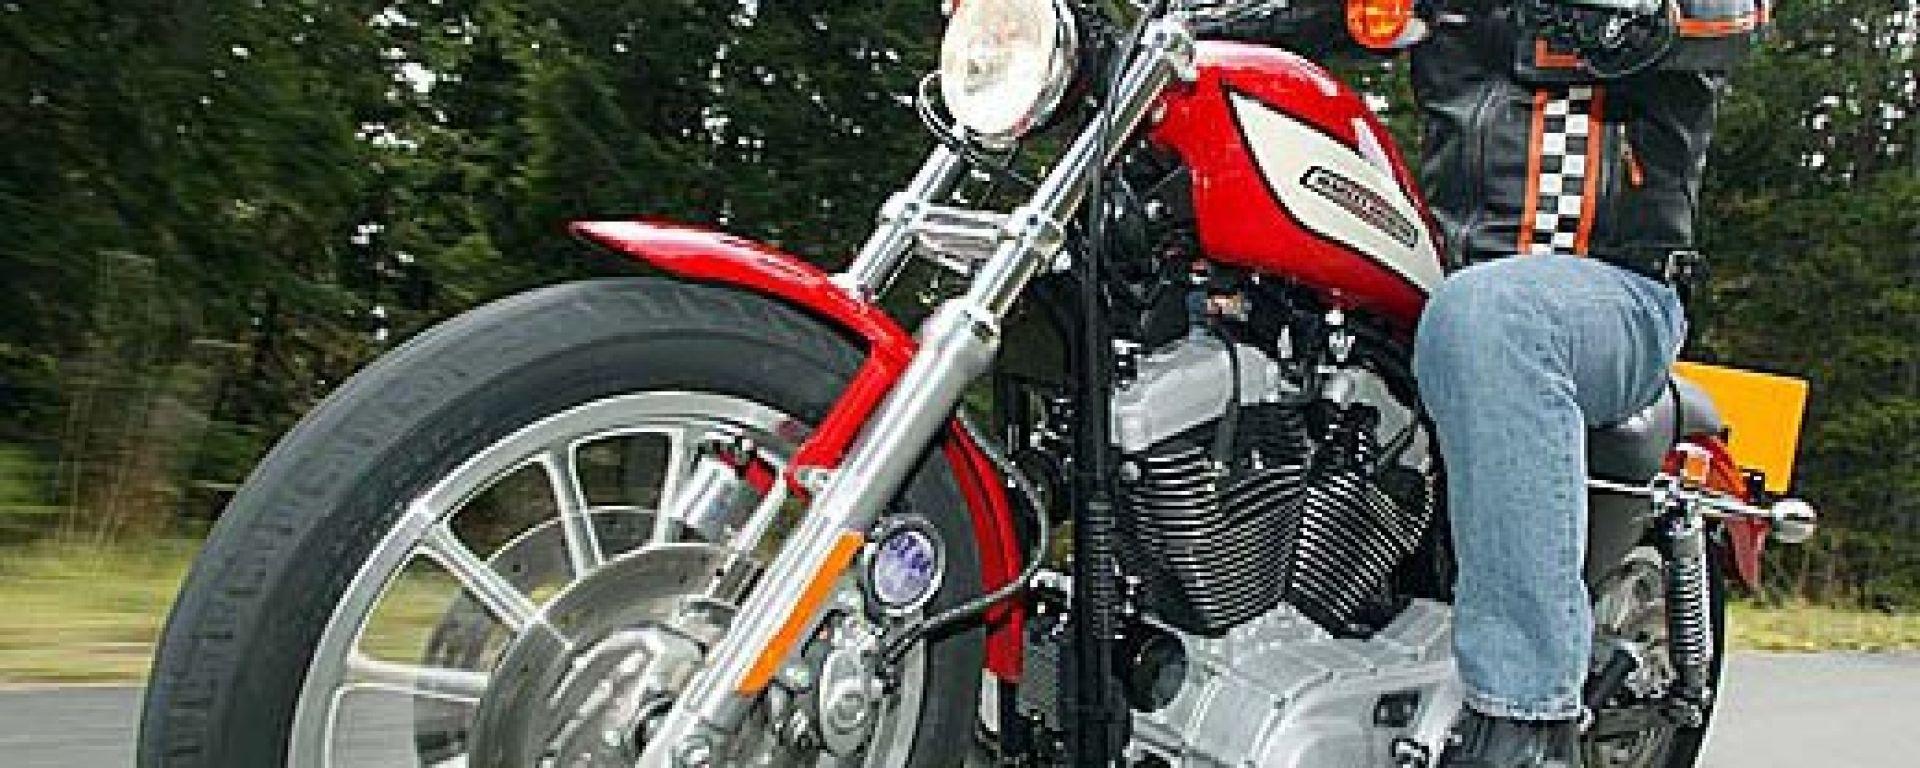 Harley Davidson Sportster '04